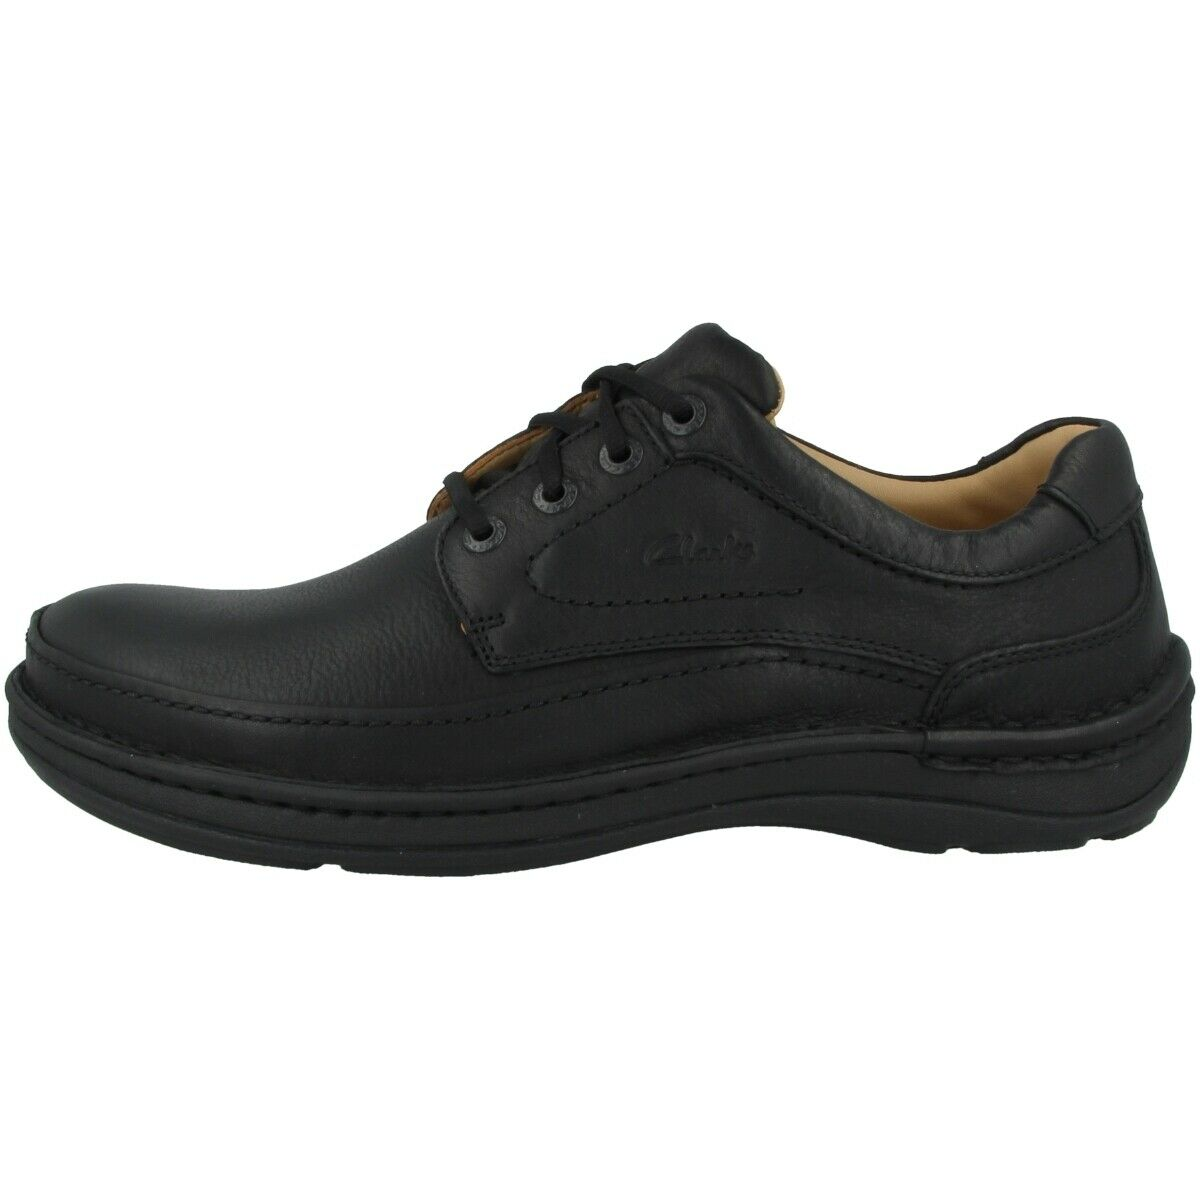 Clarks Nature Three Schuhe Herren Halbschuhe Leder Schnürschuhe schwarz 20339008